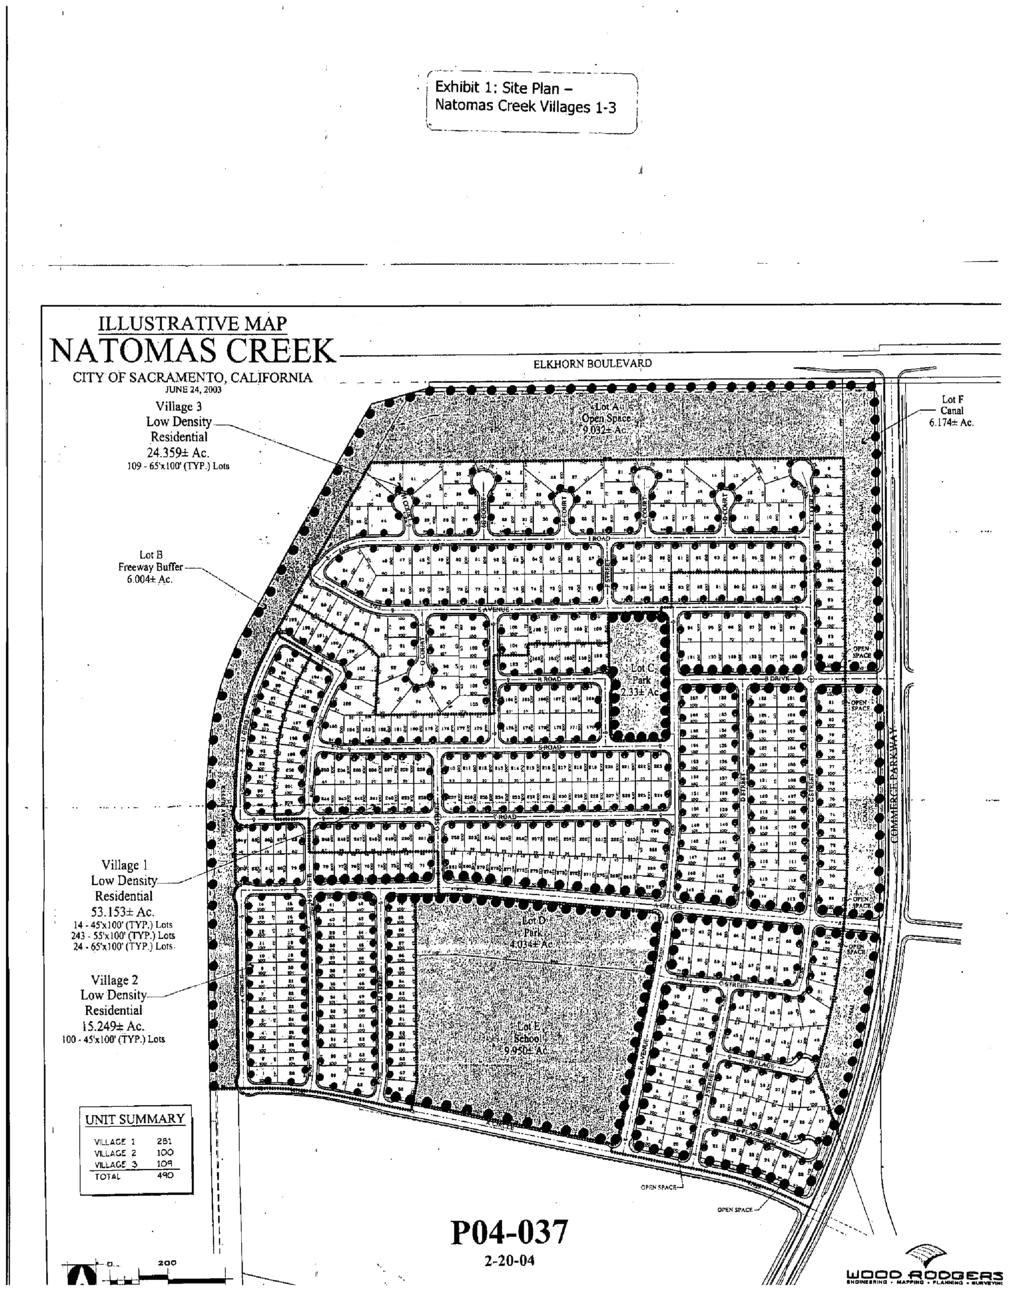 exhibit 1 site plan natomas creek villages 1 3 llustratve map natomas creek cty